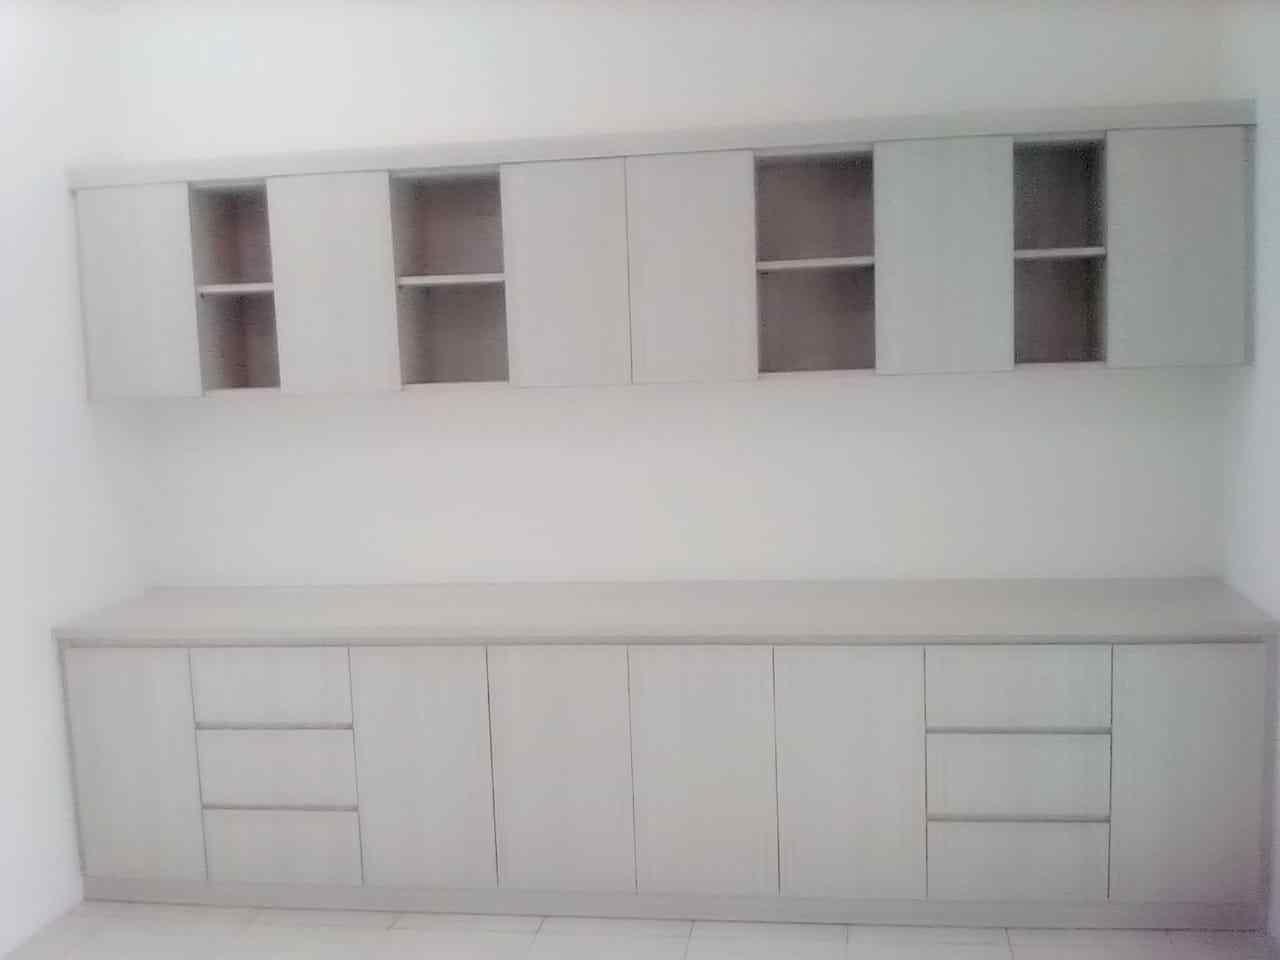 Hasil pekerjaan jasa renovasi kantor di Jakarta Barat 6